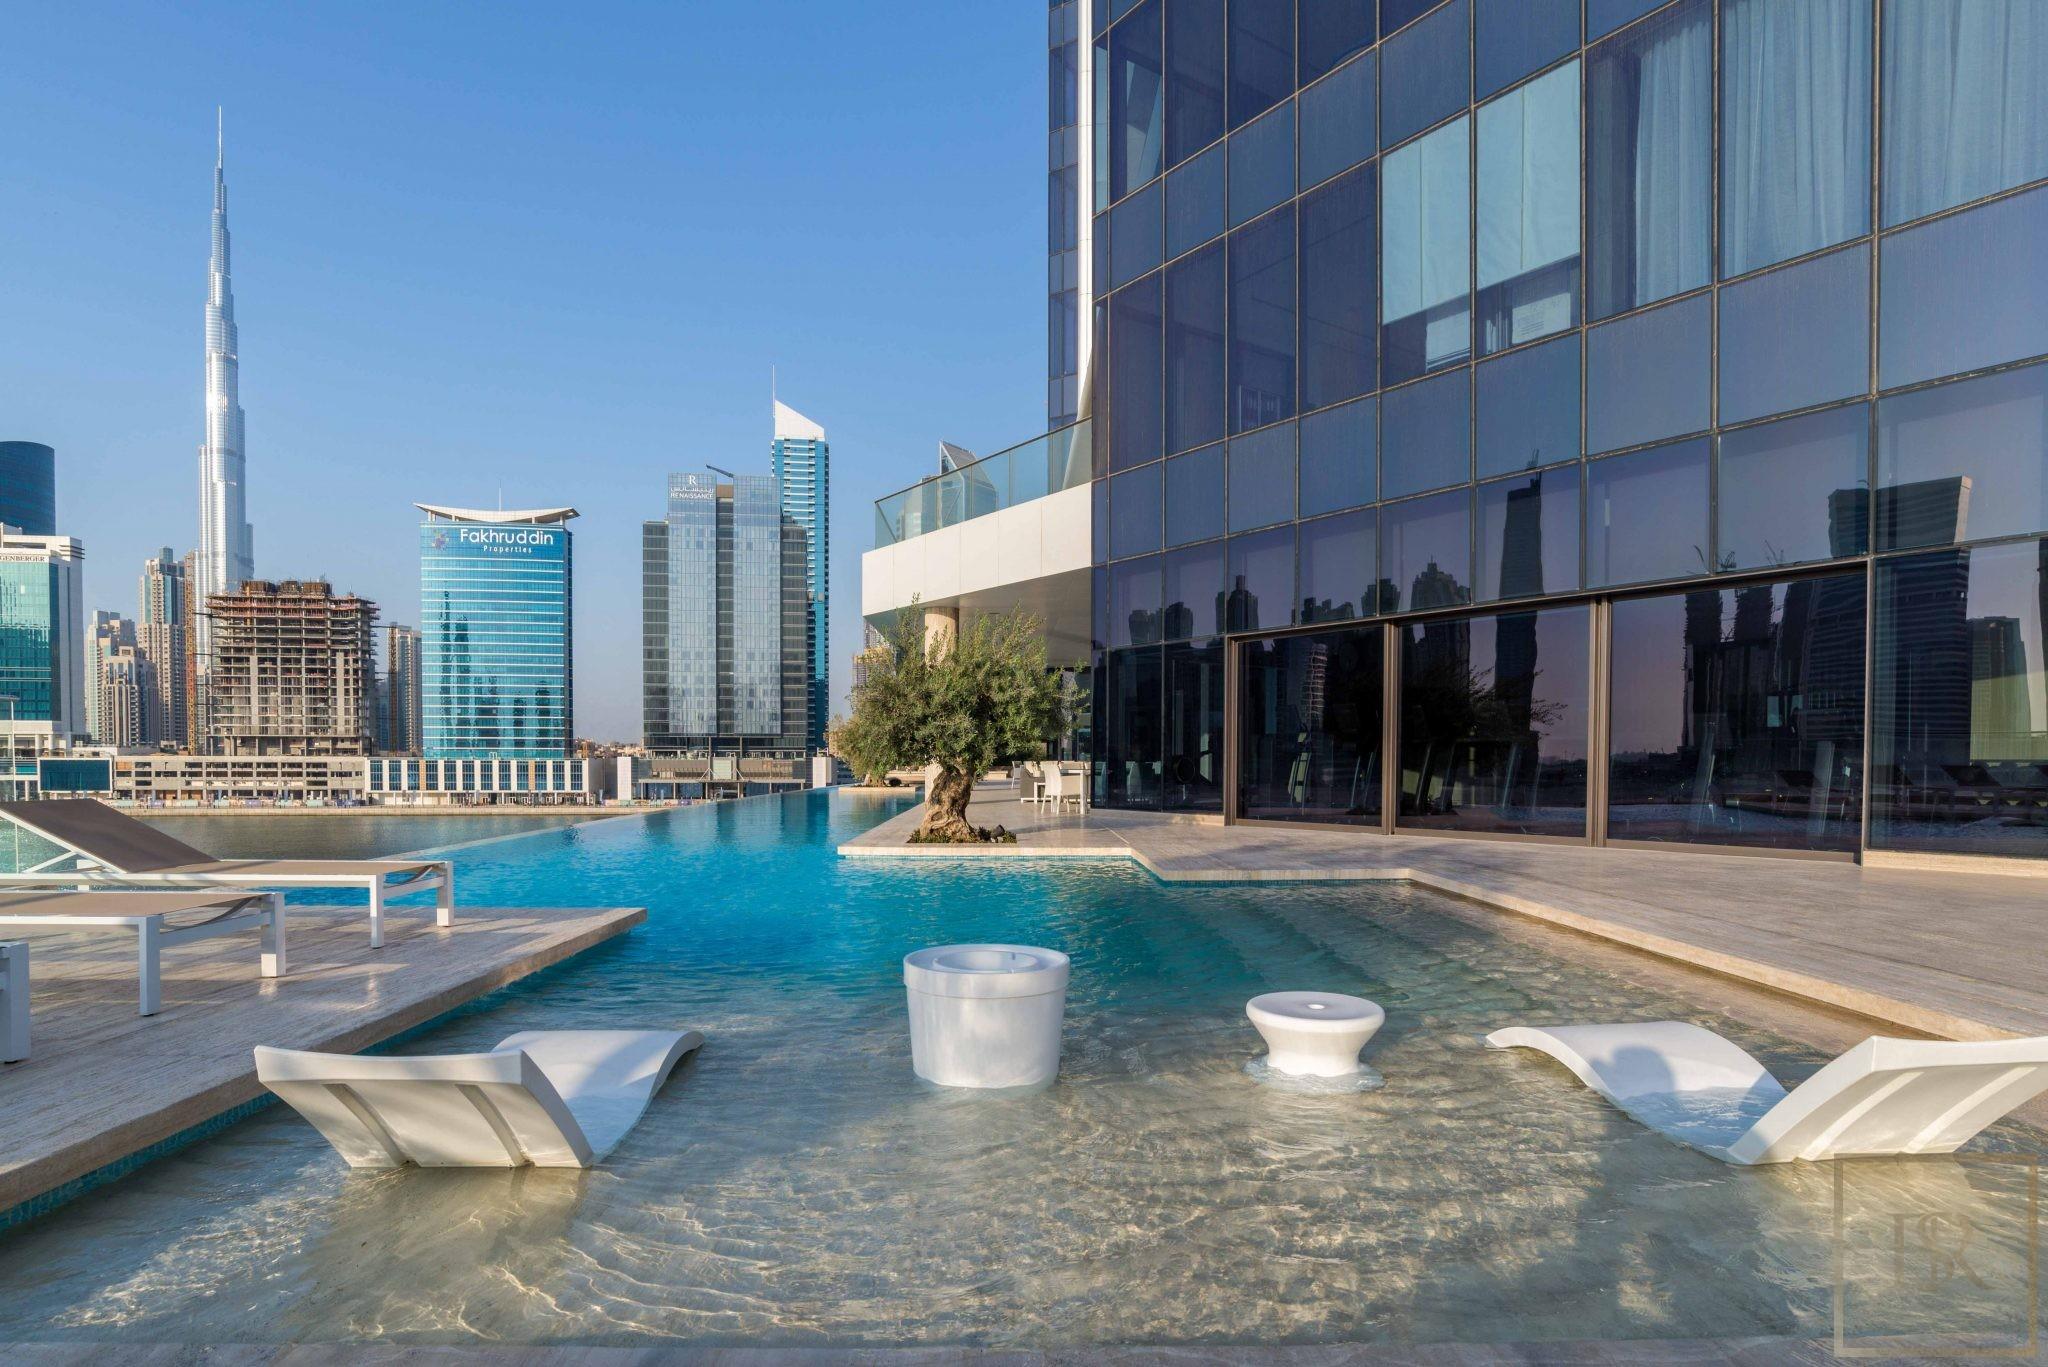 Penthouse 5 Bedrooms - Volante Business Bay, Dubai, UAE for sale For Super Rich